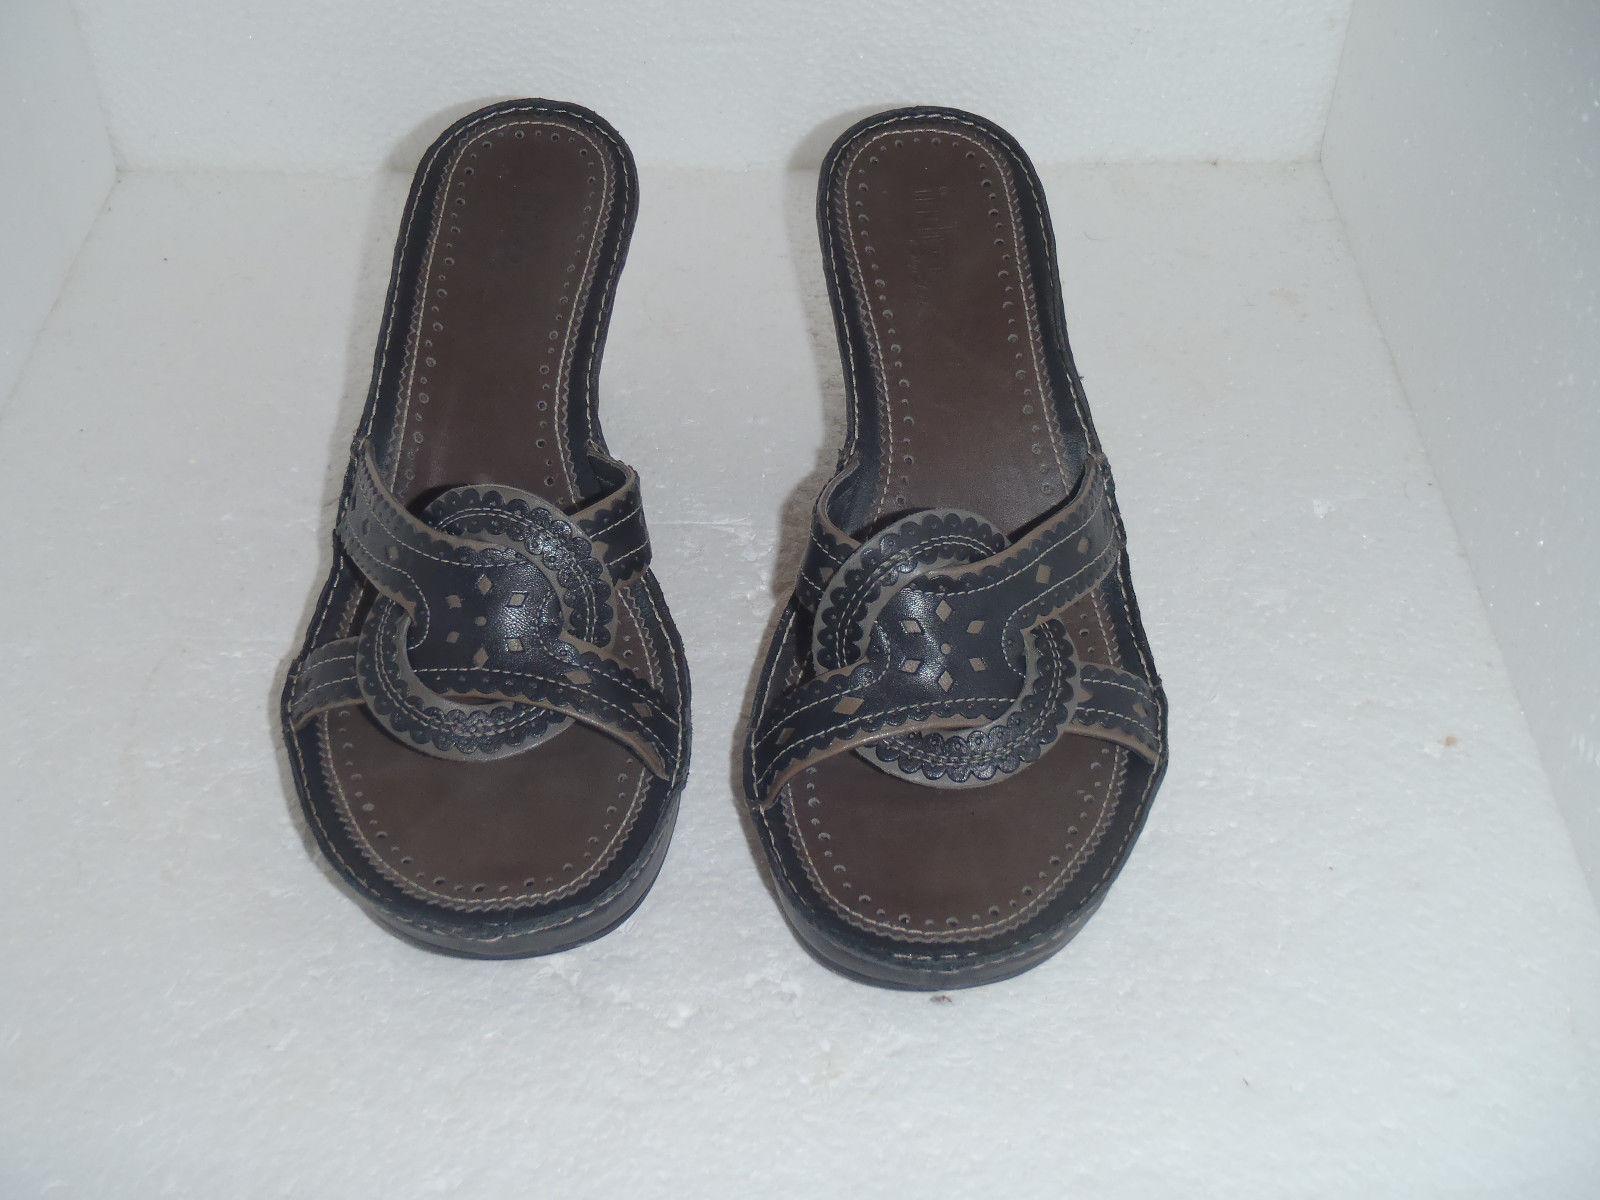 b5ba5d39a7f Size 6.5 Womens INDIGO Clarks Black Gray and 50 similar items